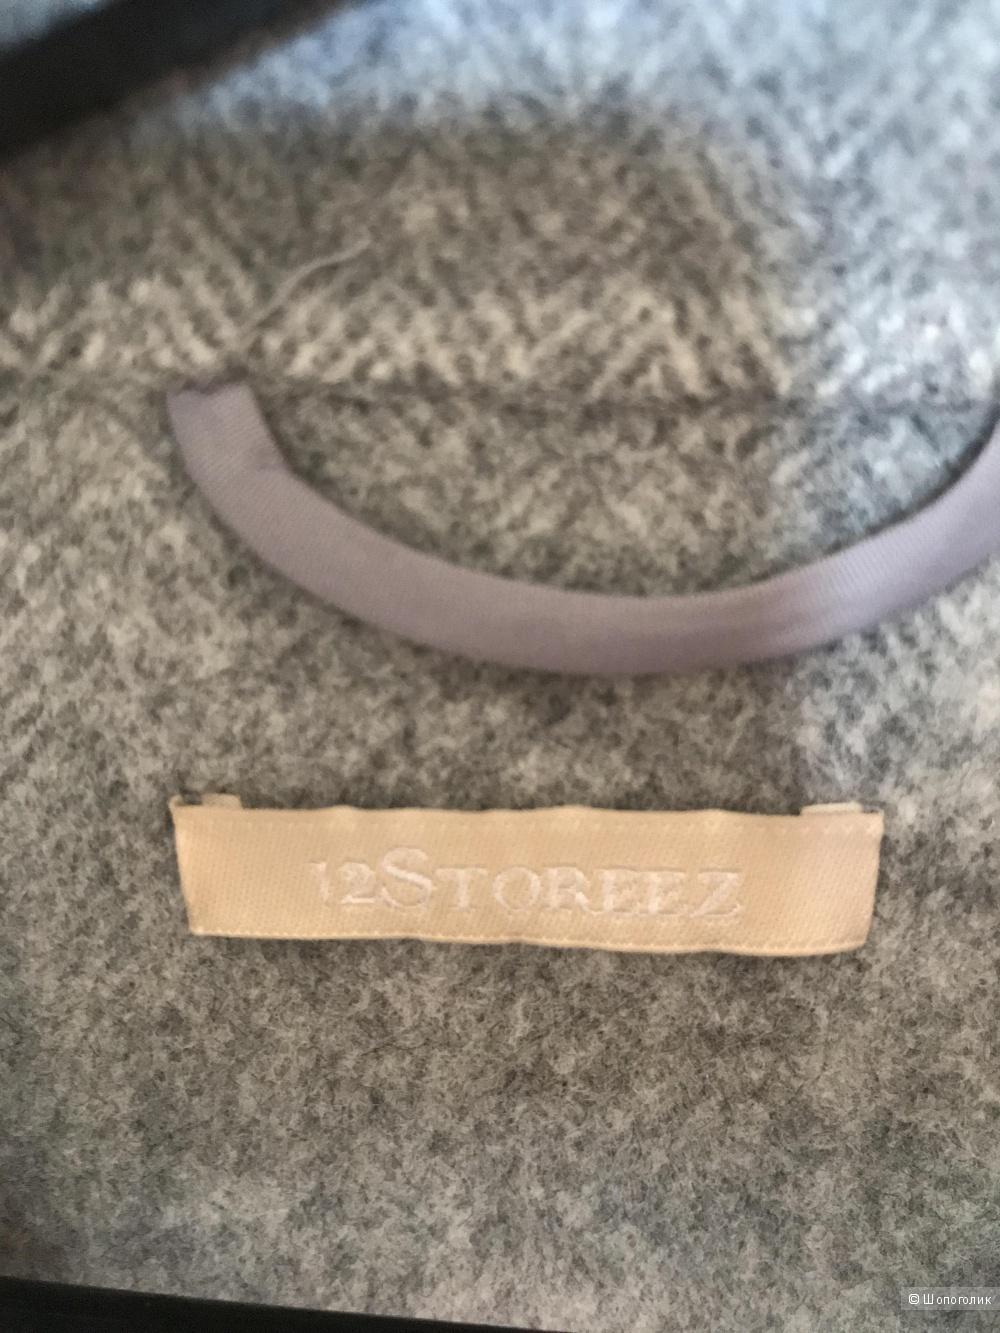 Пальто 12storeez, размер S